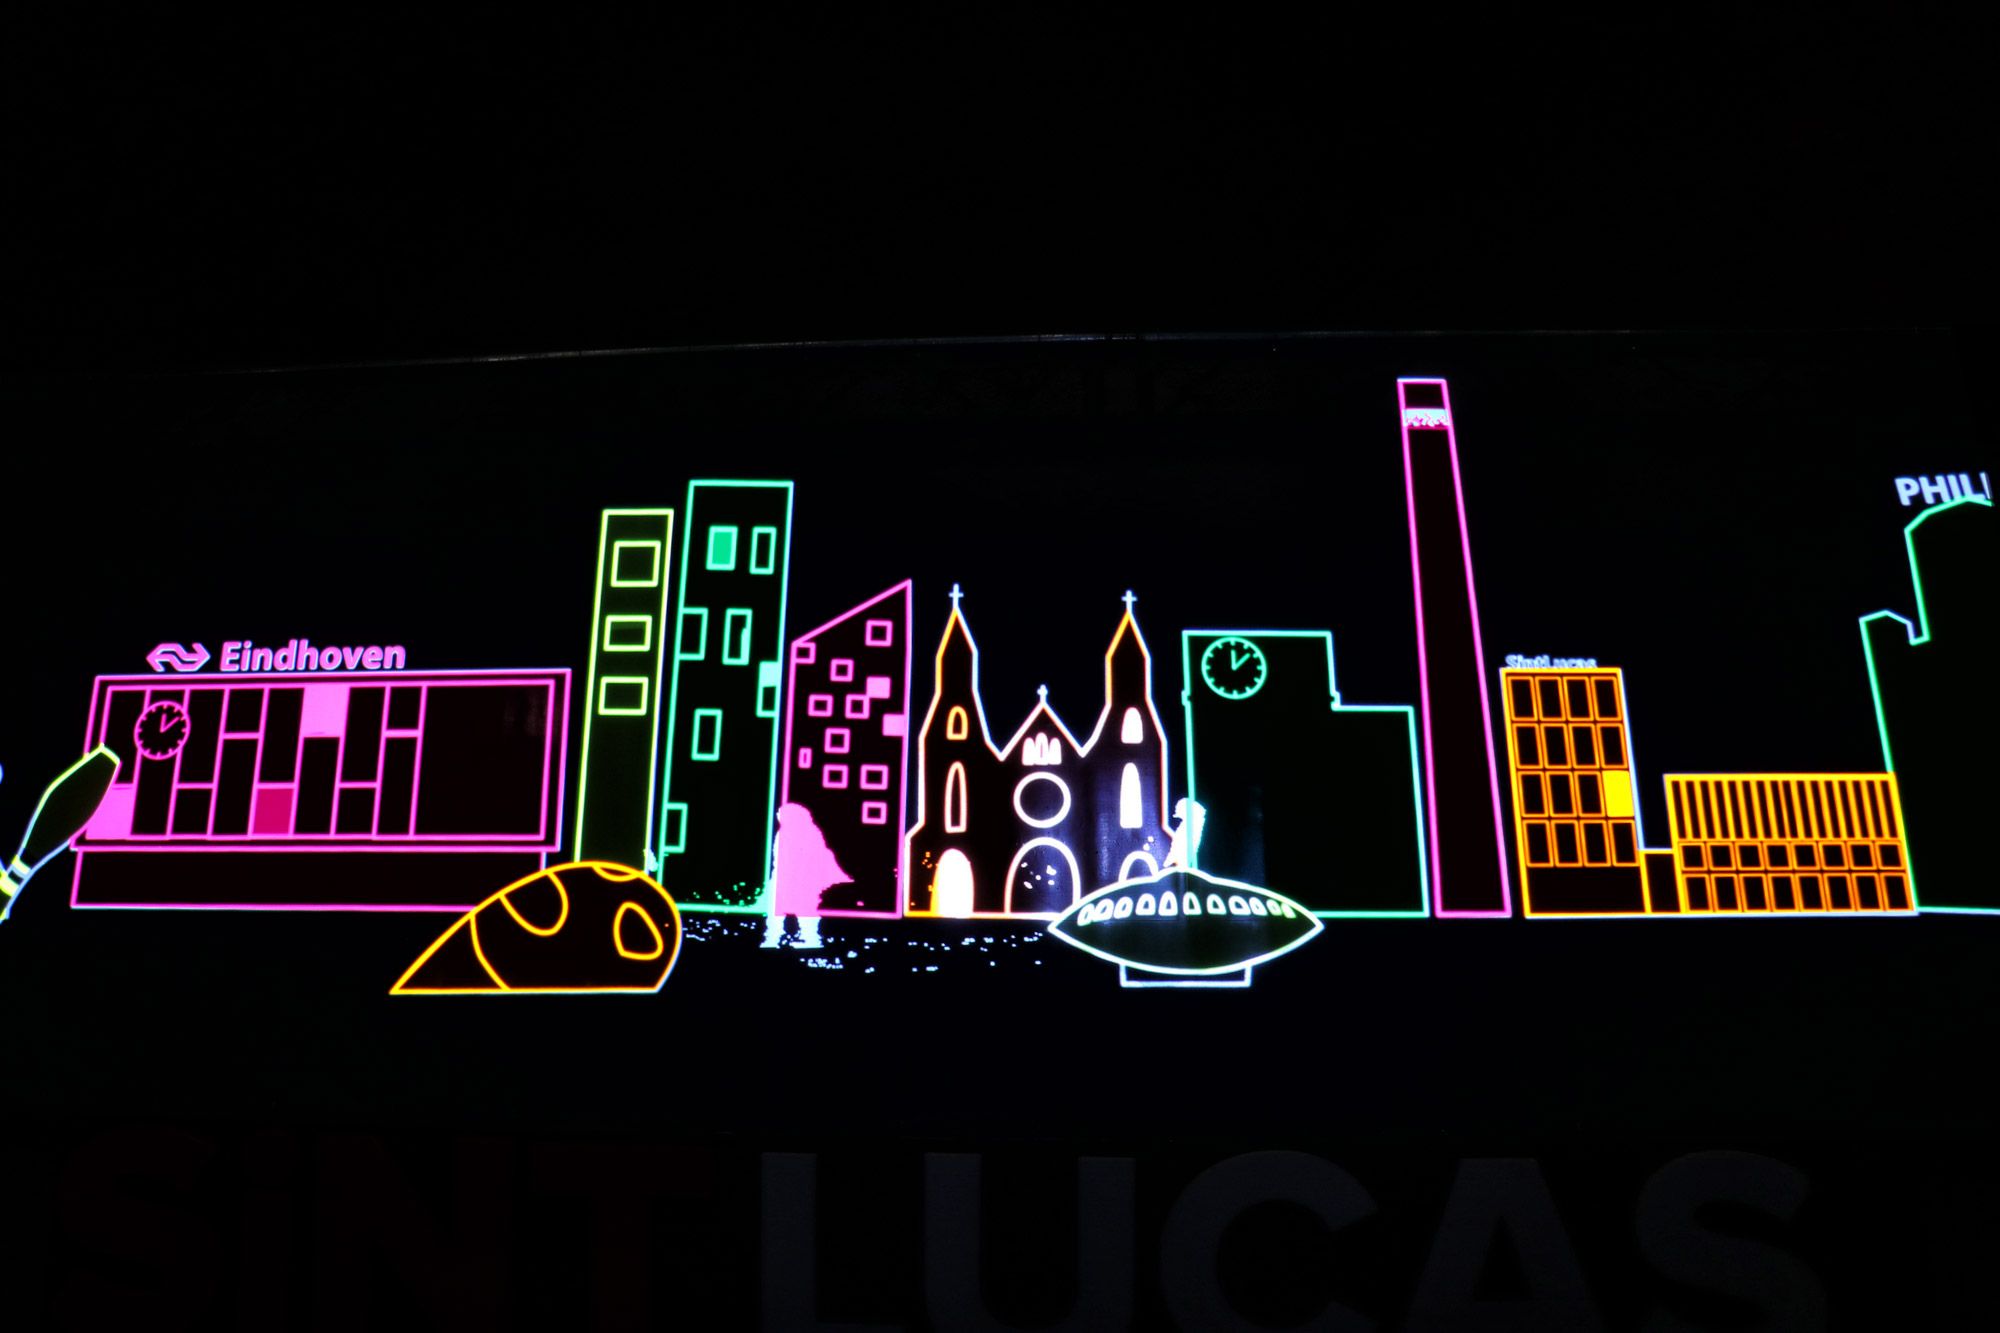 Glow Eindhoven 2019